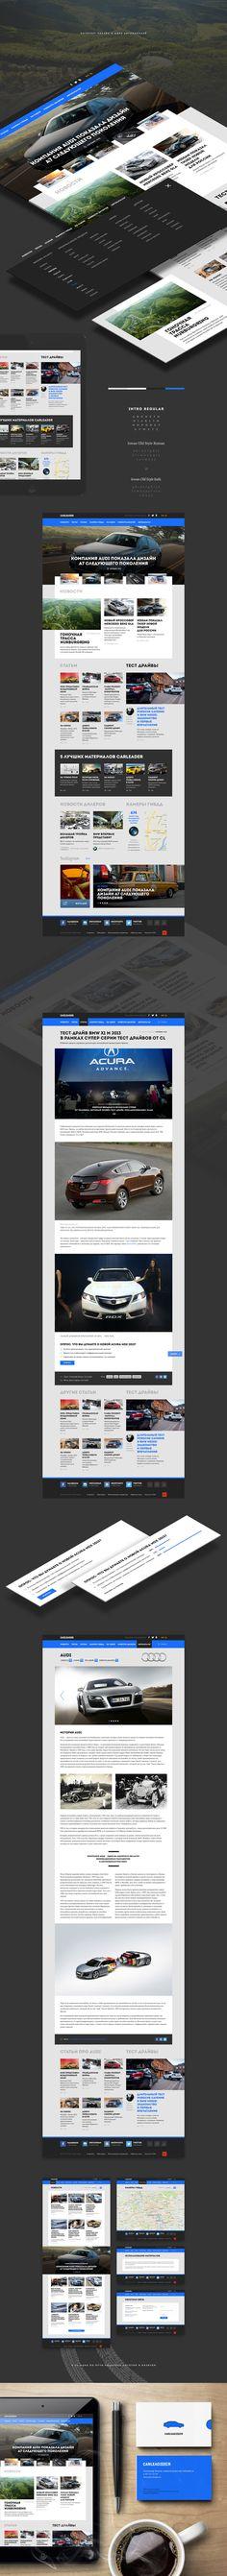 Carleader Сайт © Сергей Капустин #website #webdesign #design #portal #car #article #auto